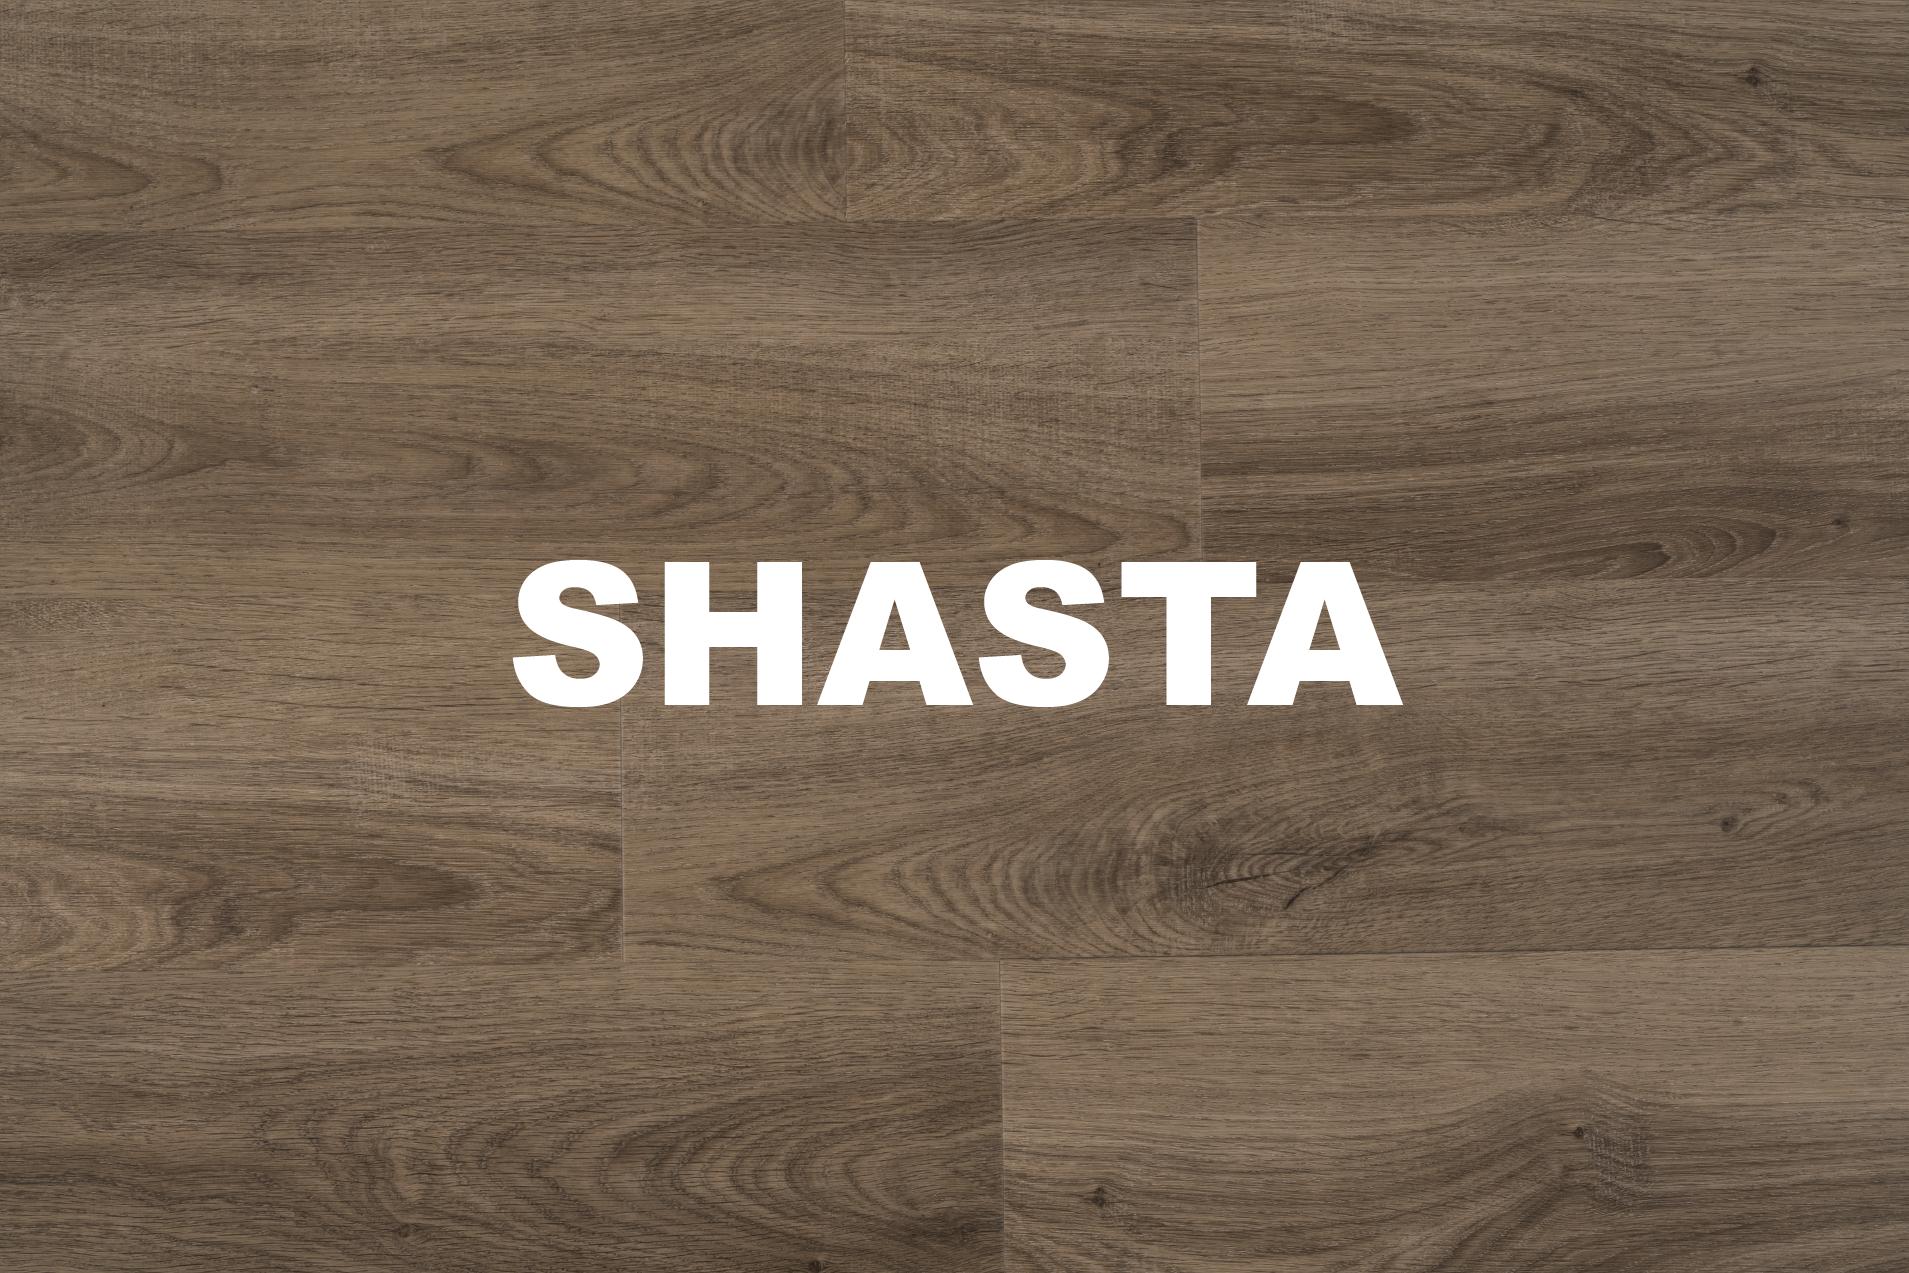 Shasta.png